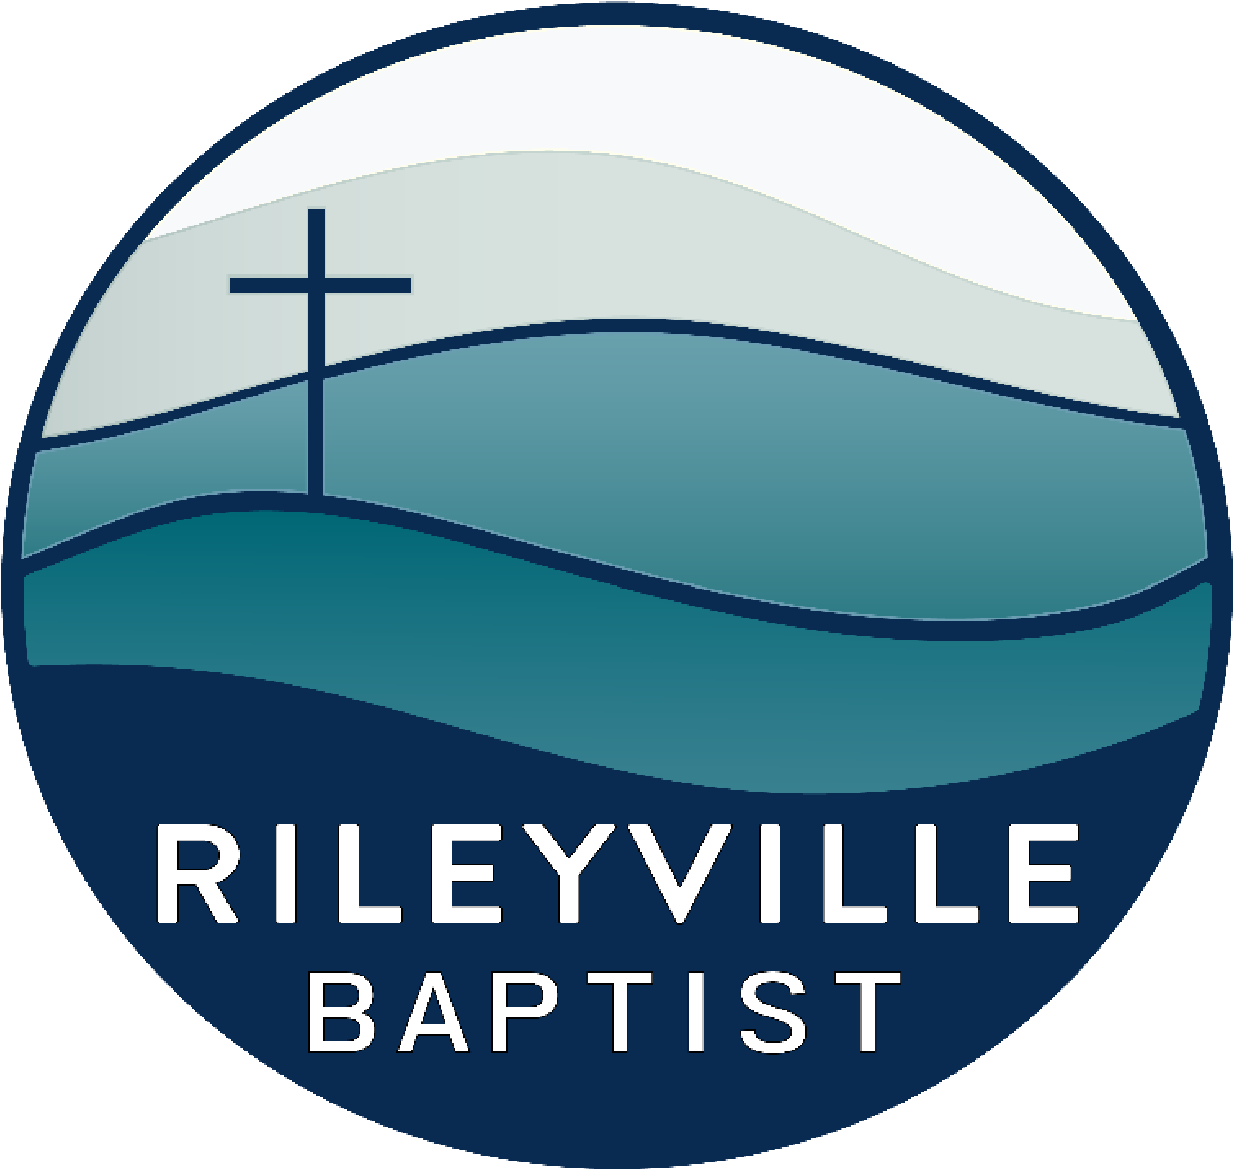 Rileyville Baptist Church